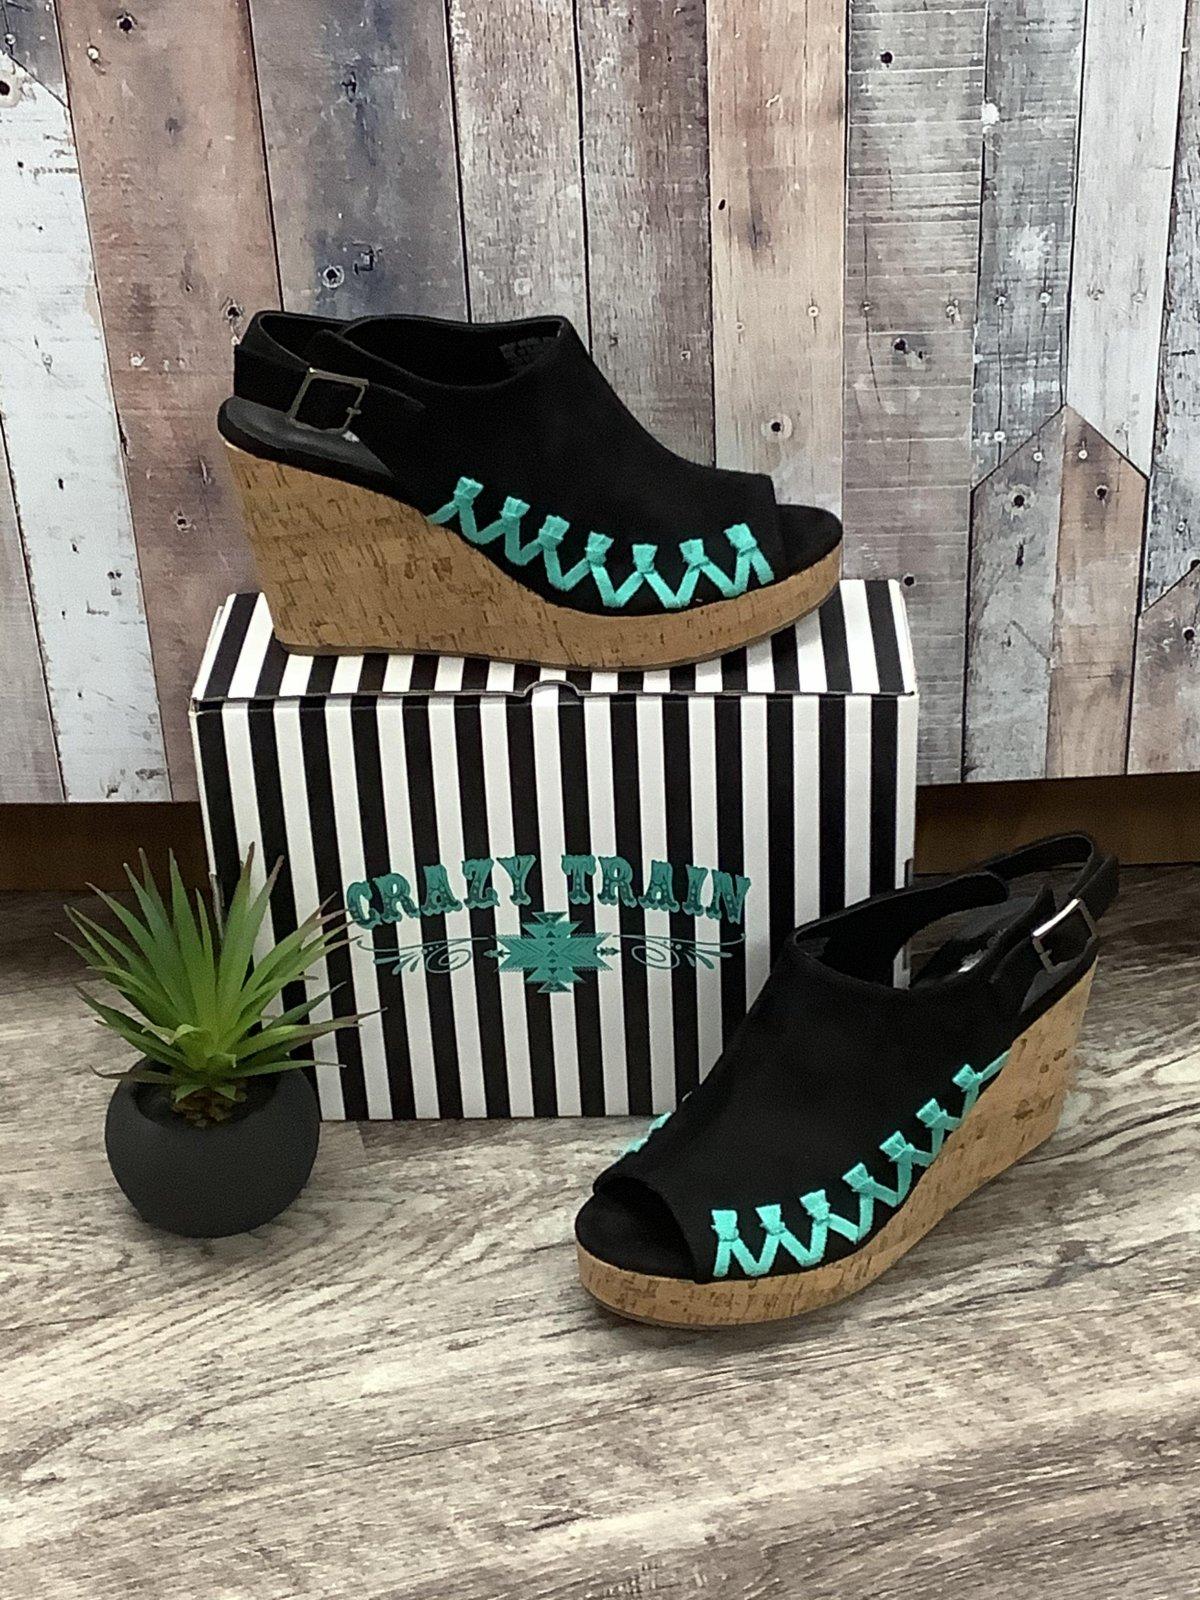 Black & Turquoise Whip Wedge Sandal